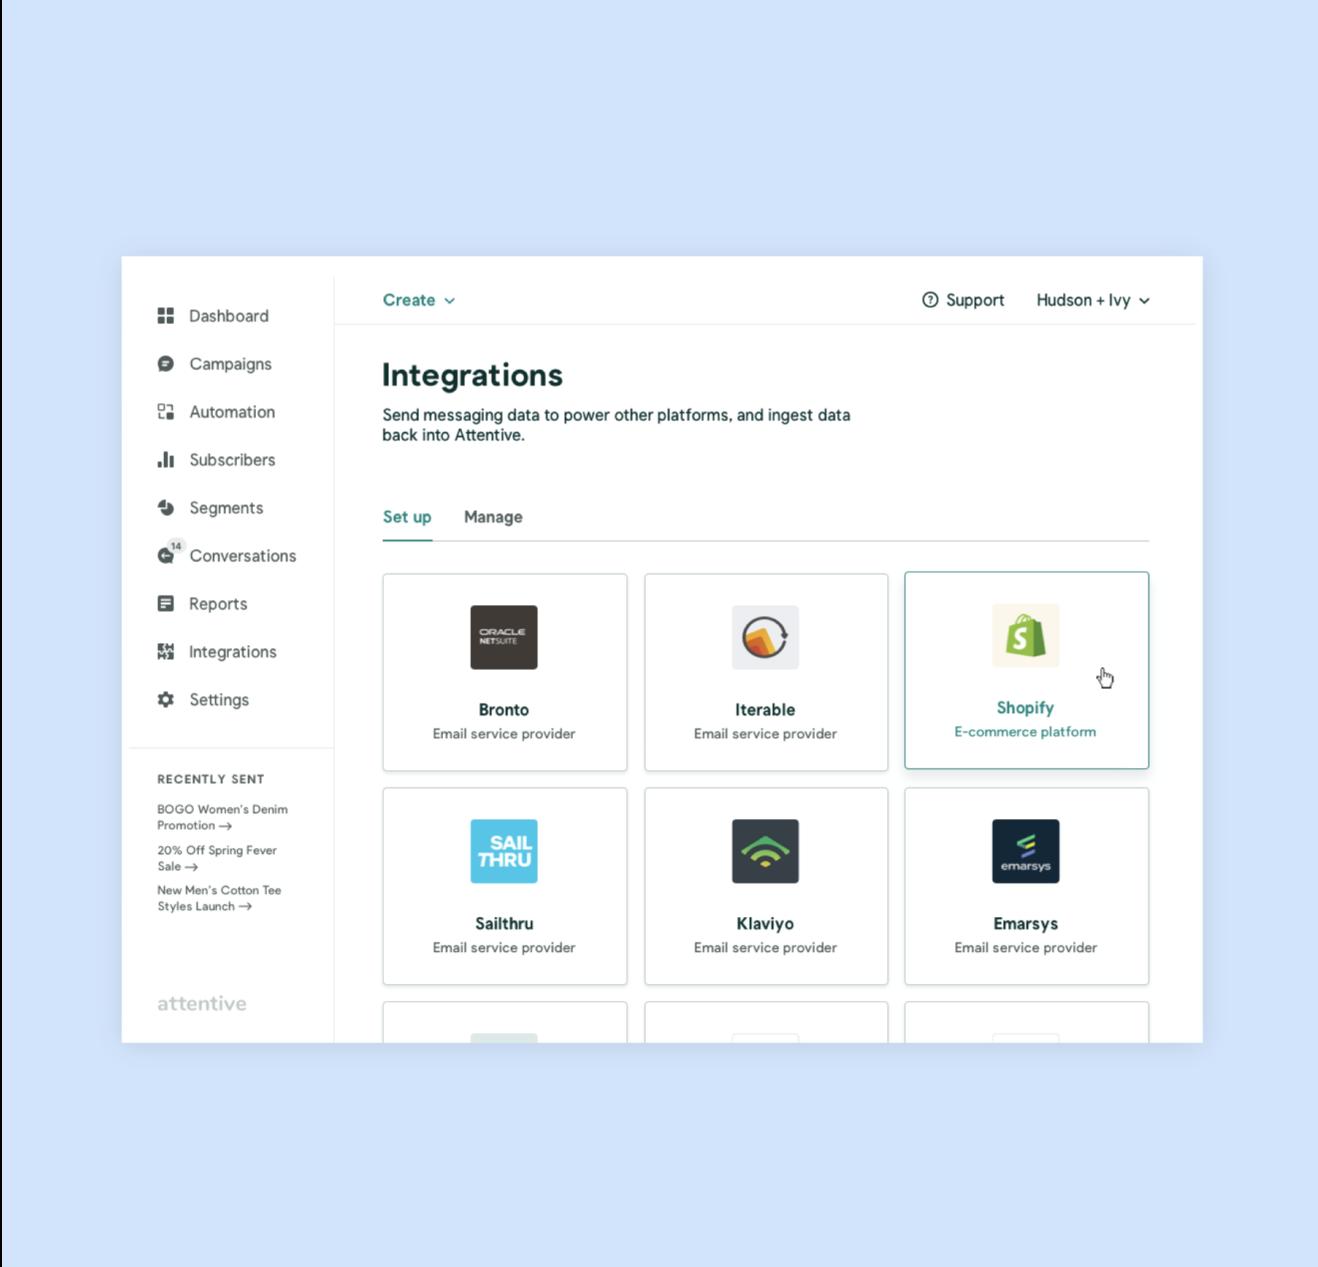 craft your program - integrations image